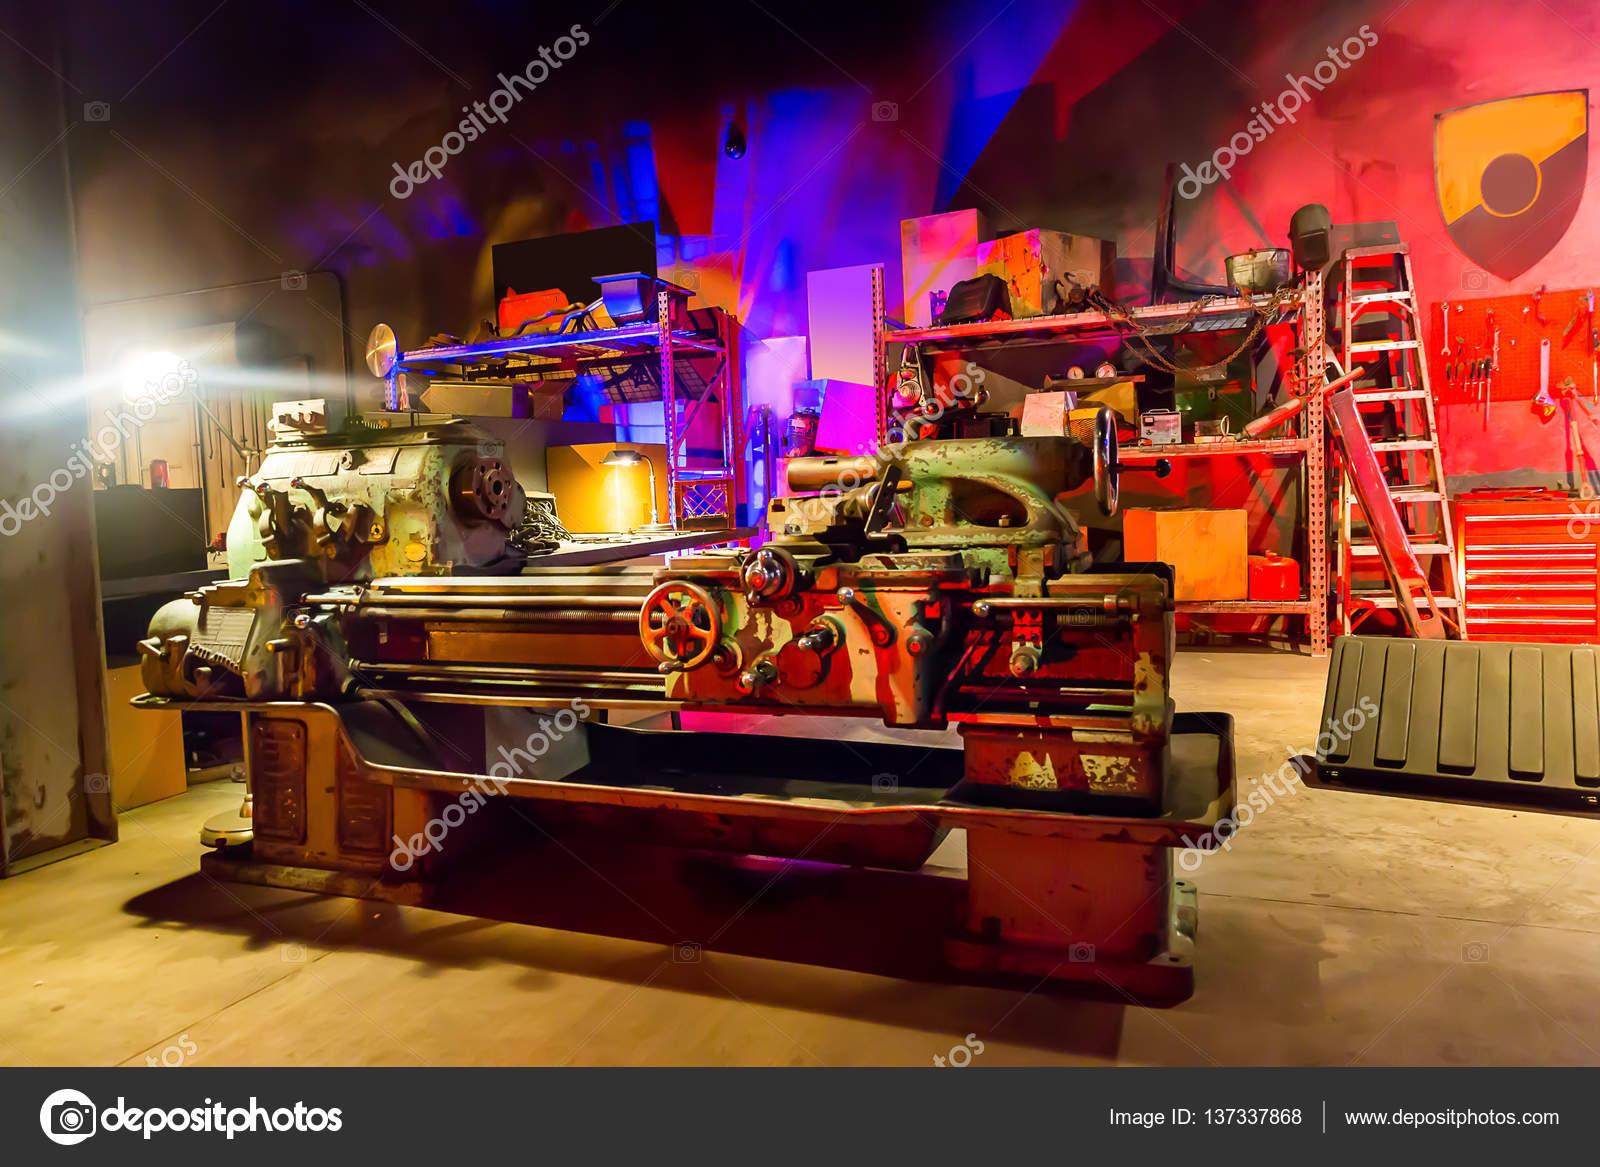 Garage Workshop With Tools Stock Photo C Nomadsoul1 137337868